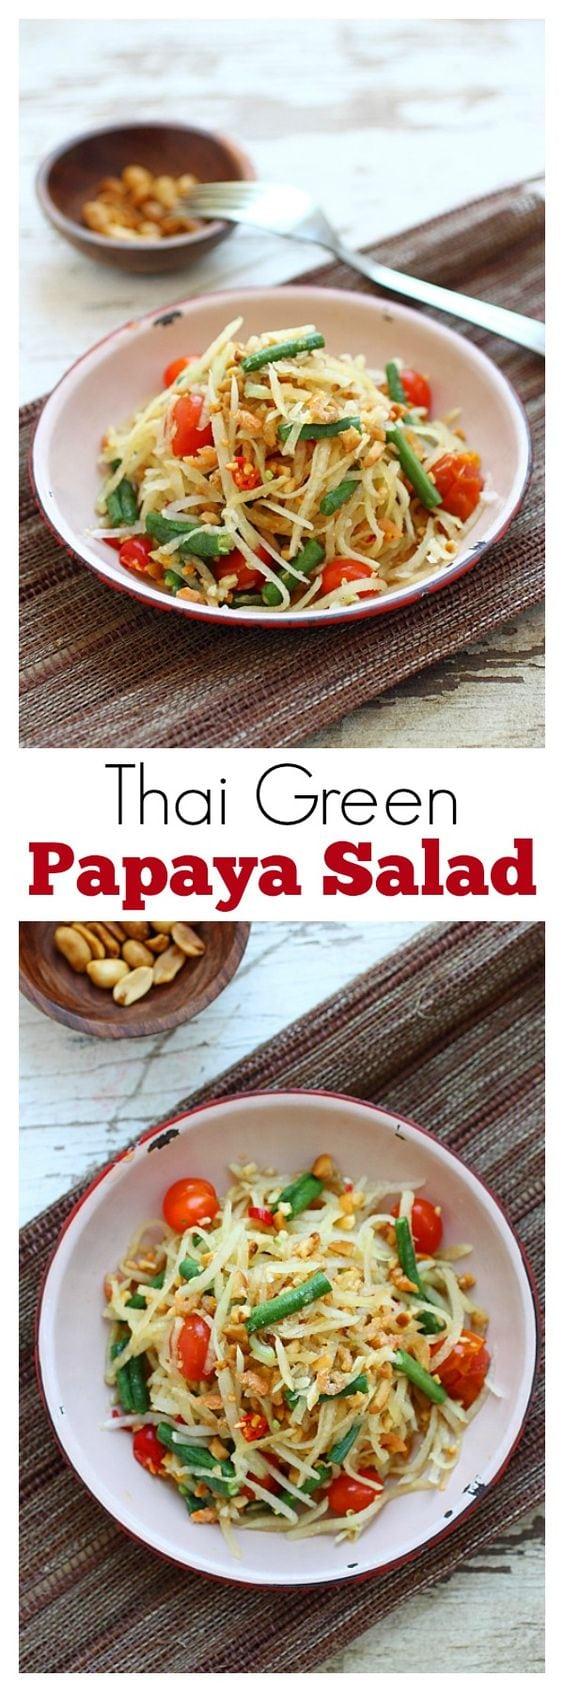 Thai green papaya salad – the best salad ever with shredded green papaya, long beans and tomatoes. So yummy | rasamalaysia.com